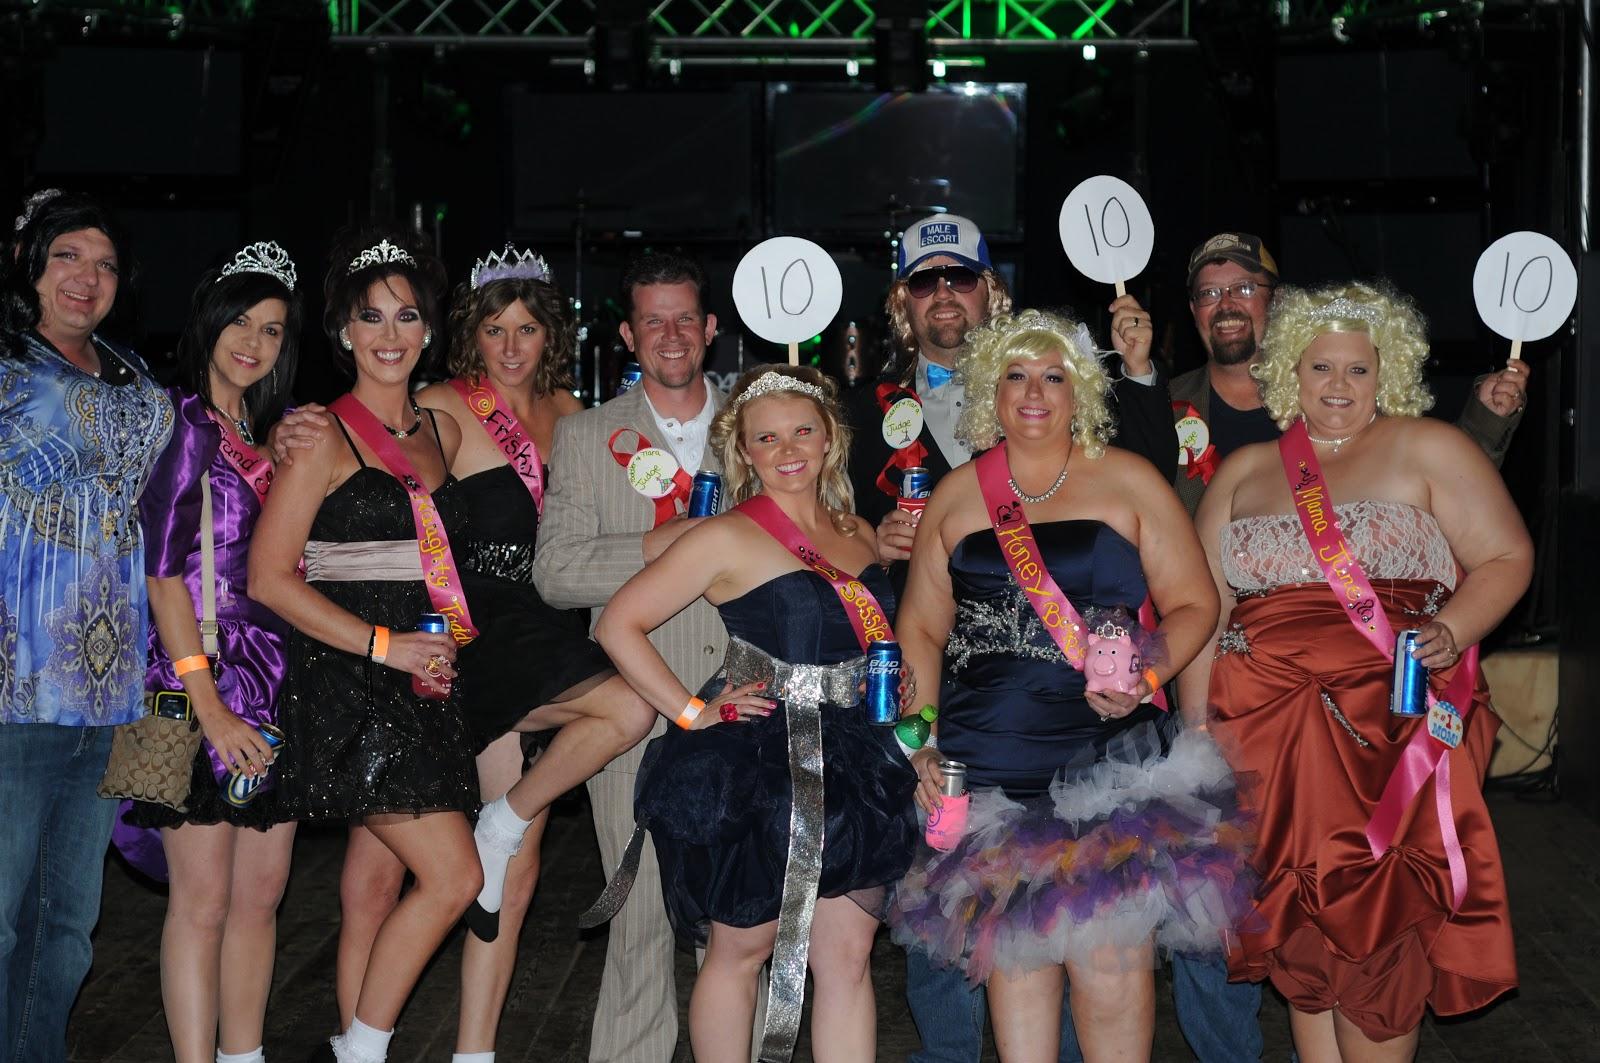 Wisconsin Badger Camp: Halloween Party